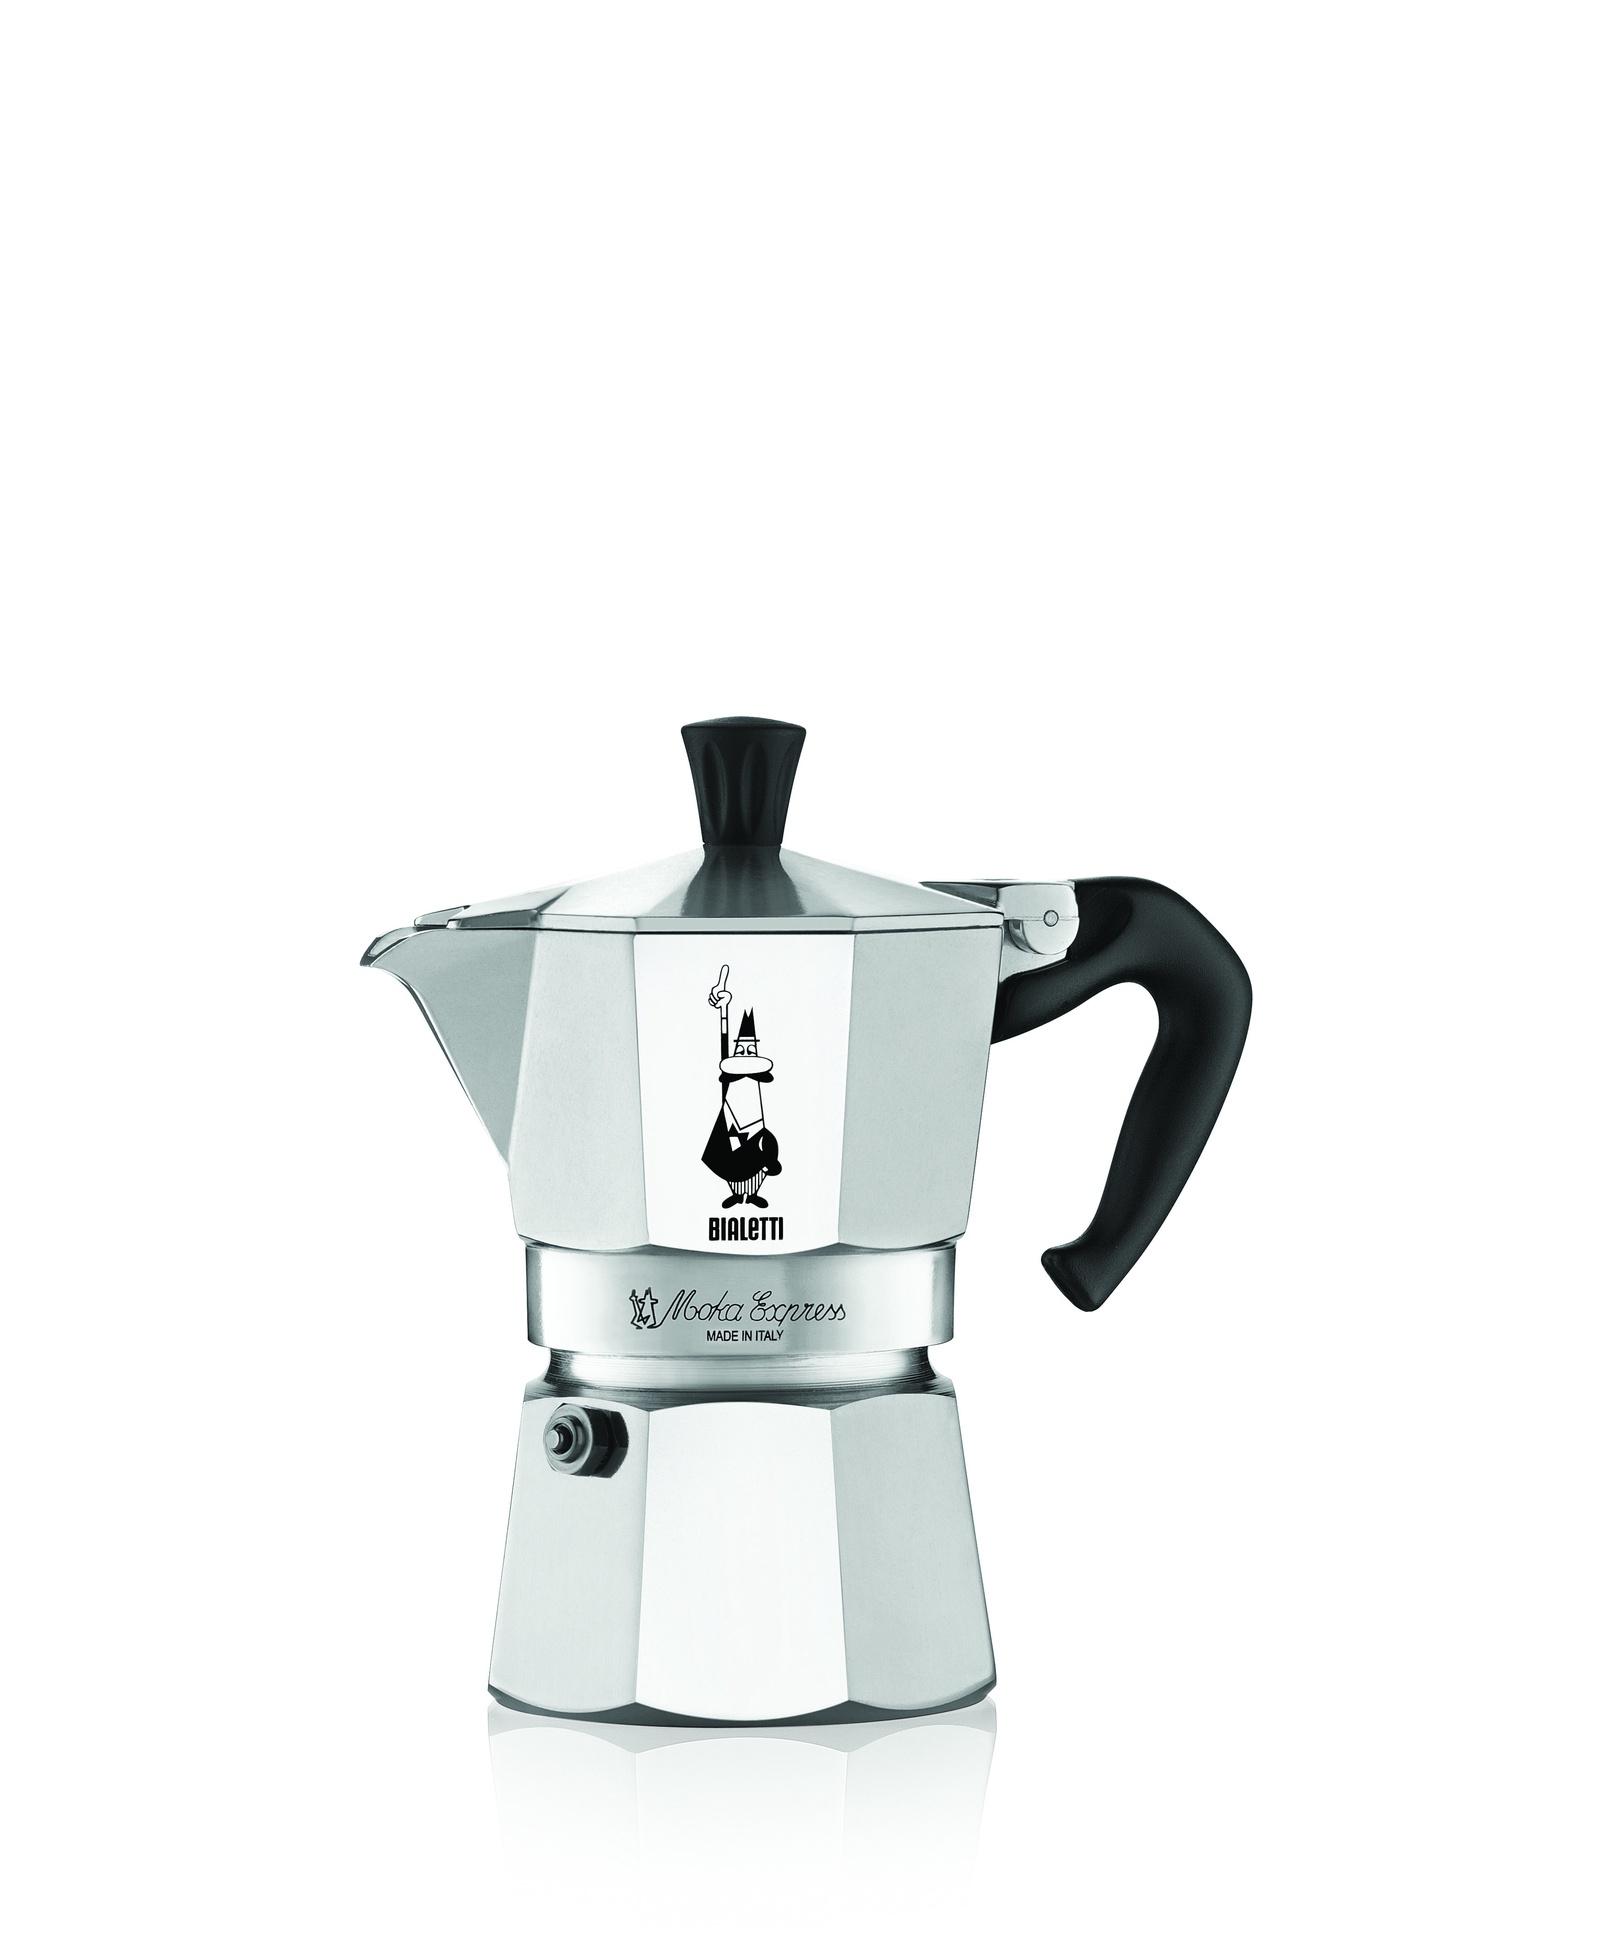 Кофеварка гейзерная Bialetti Moka Express, на 9 порций, 540 мл гейзерная кофеварка bialetti moka induzione 6 порций 4833